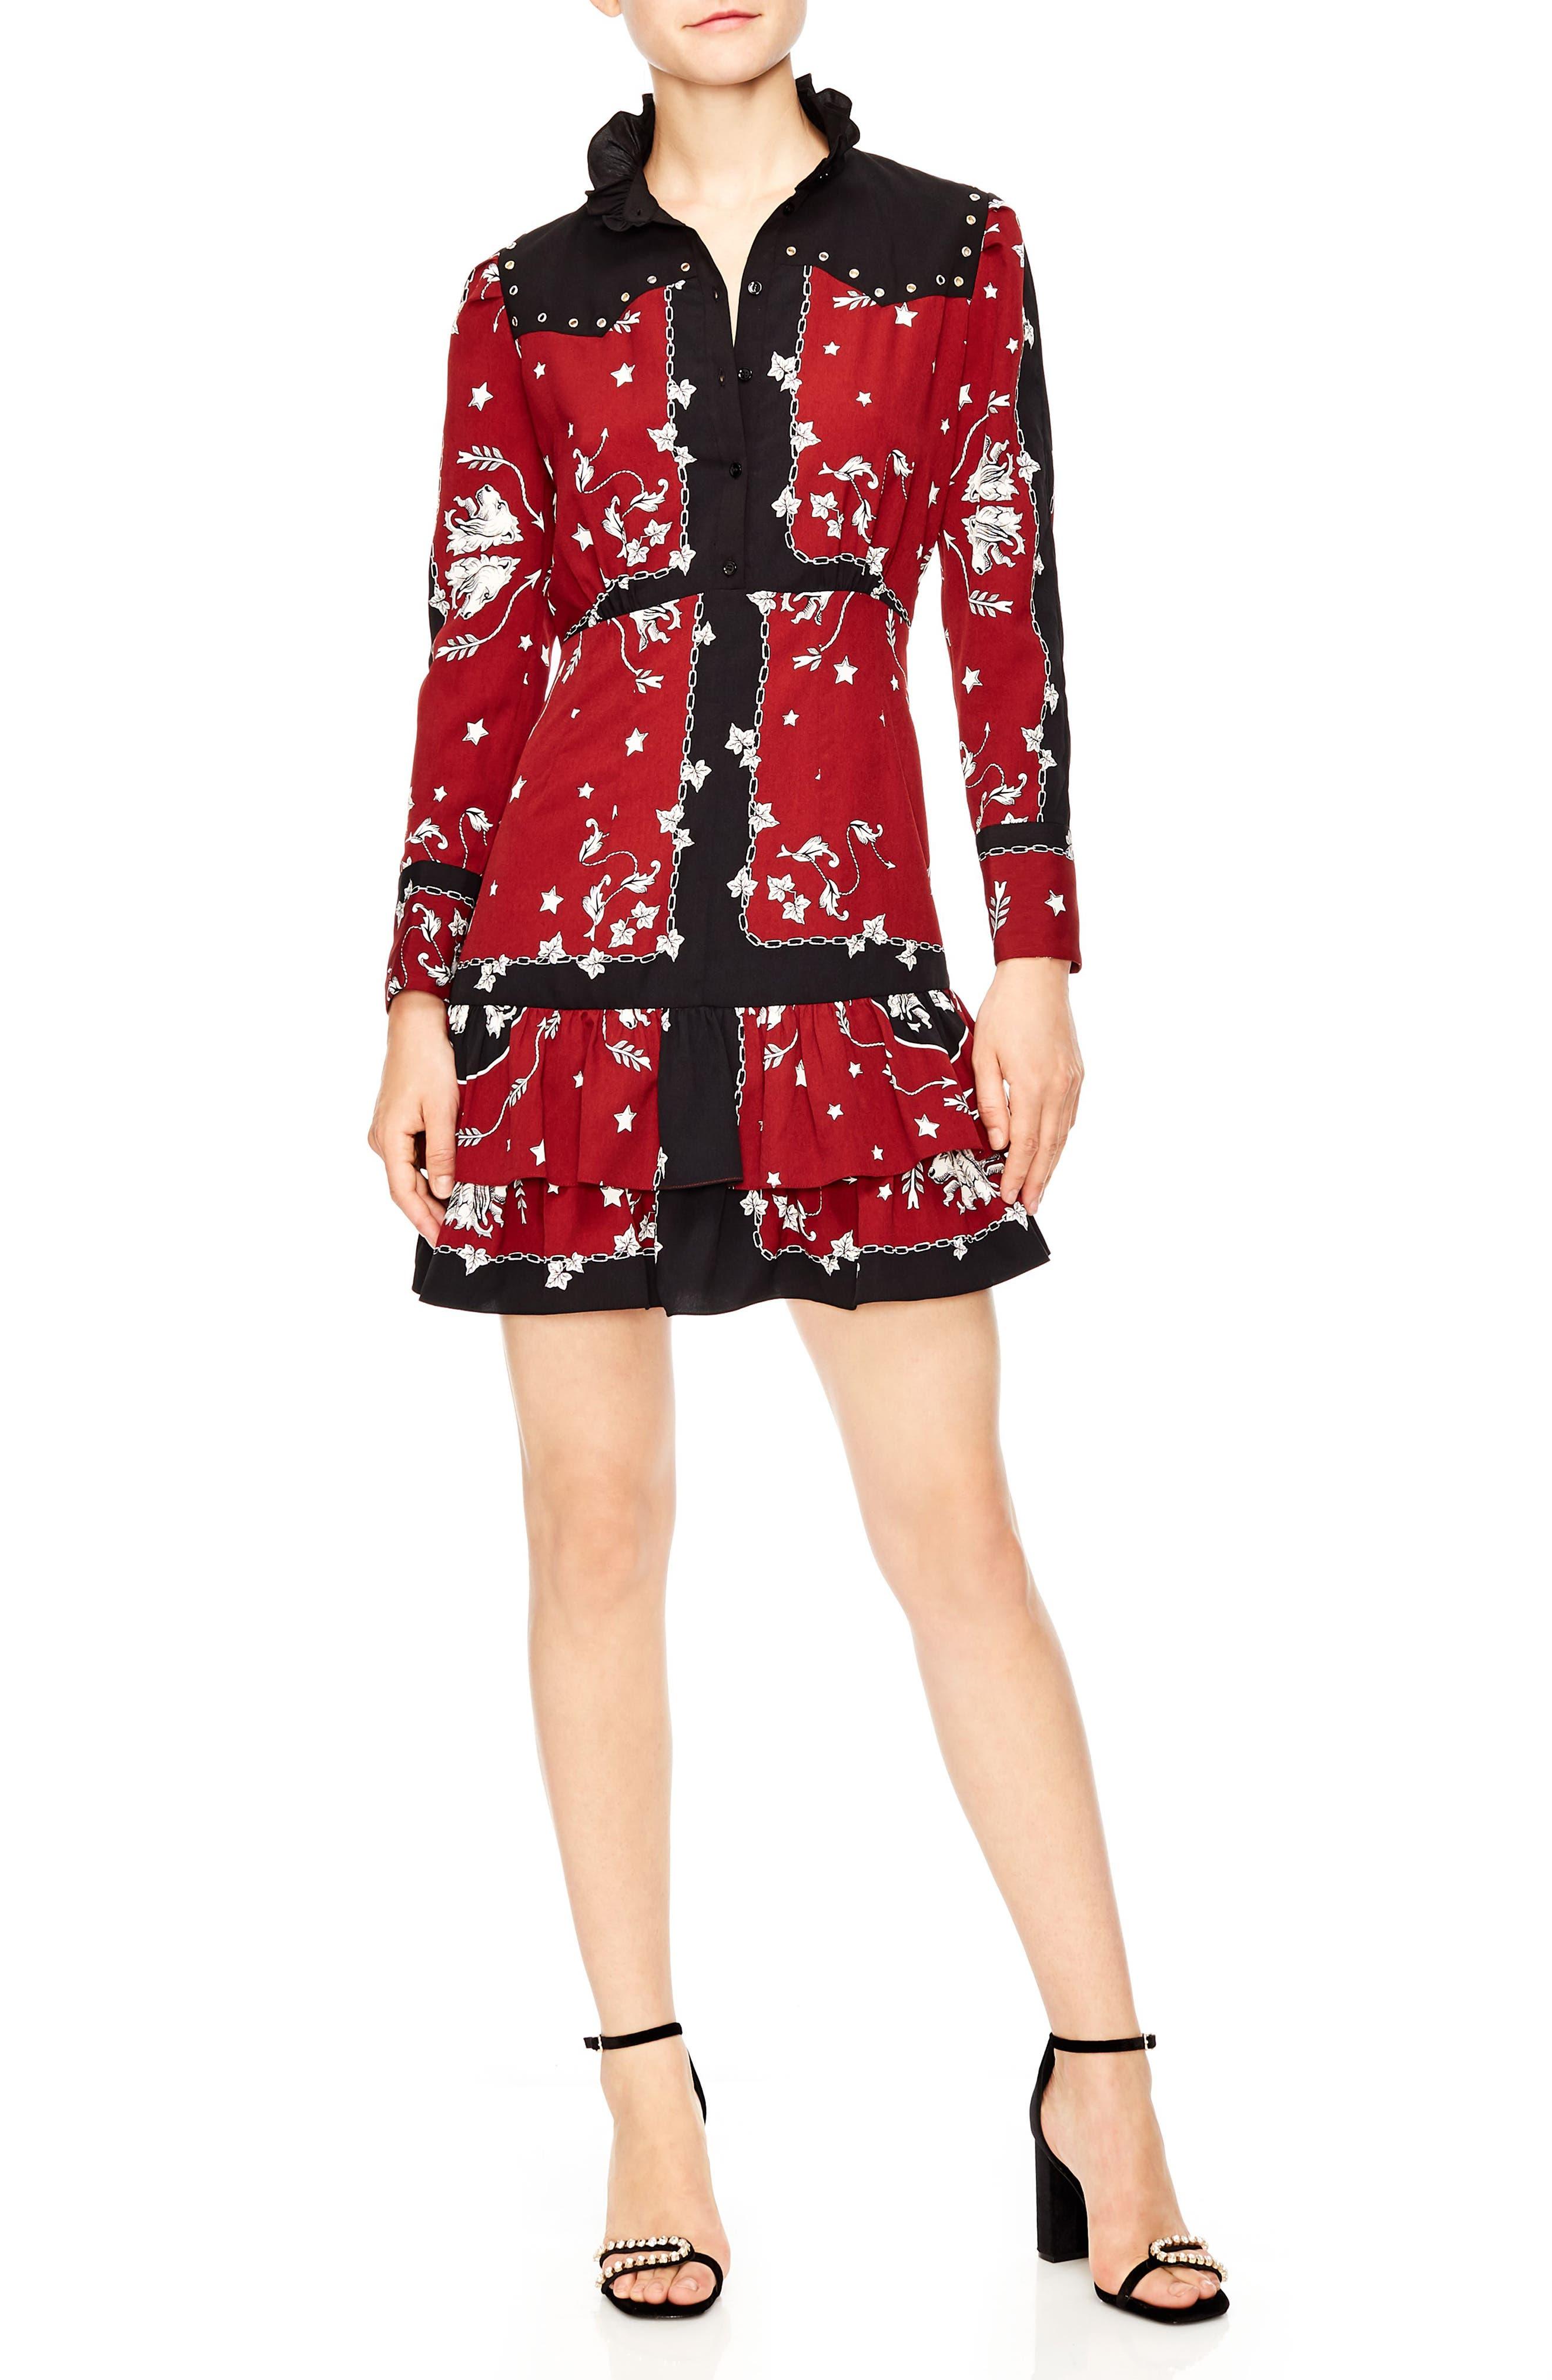 Grommet Detail Mini Dress,                         Main,                         color, BURGUNDY